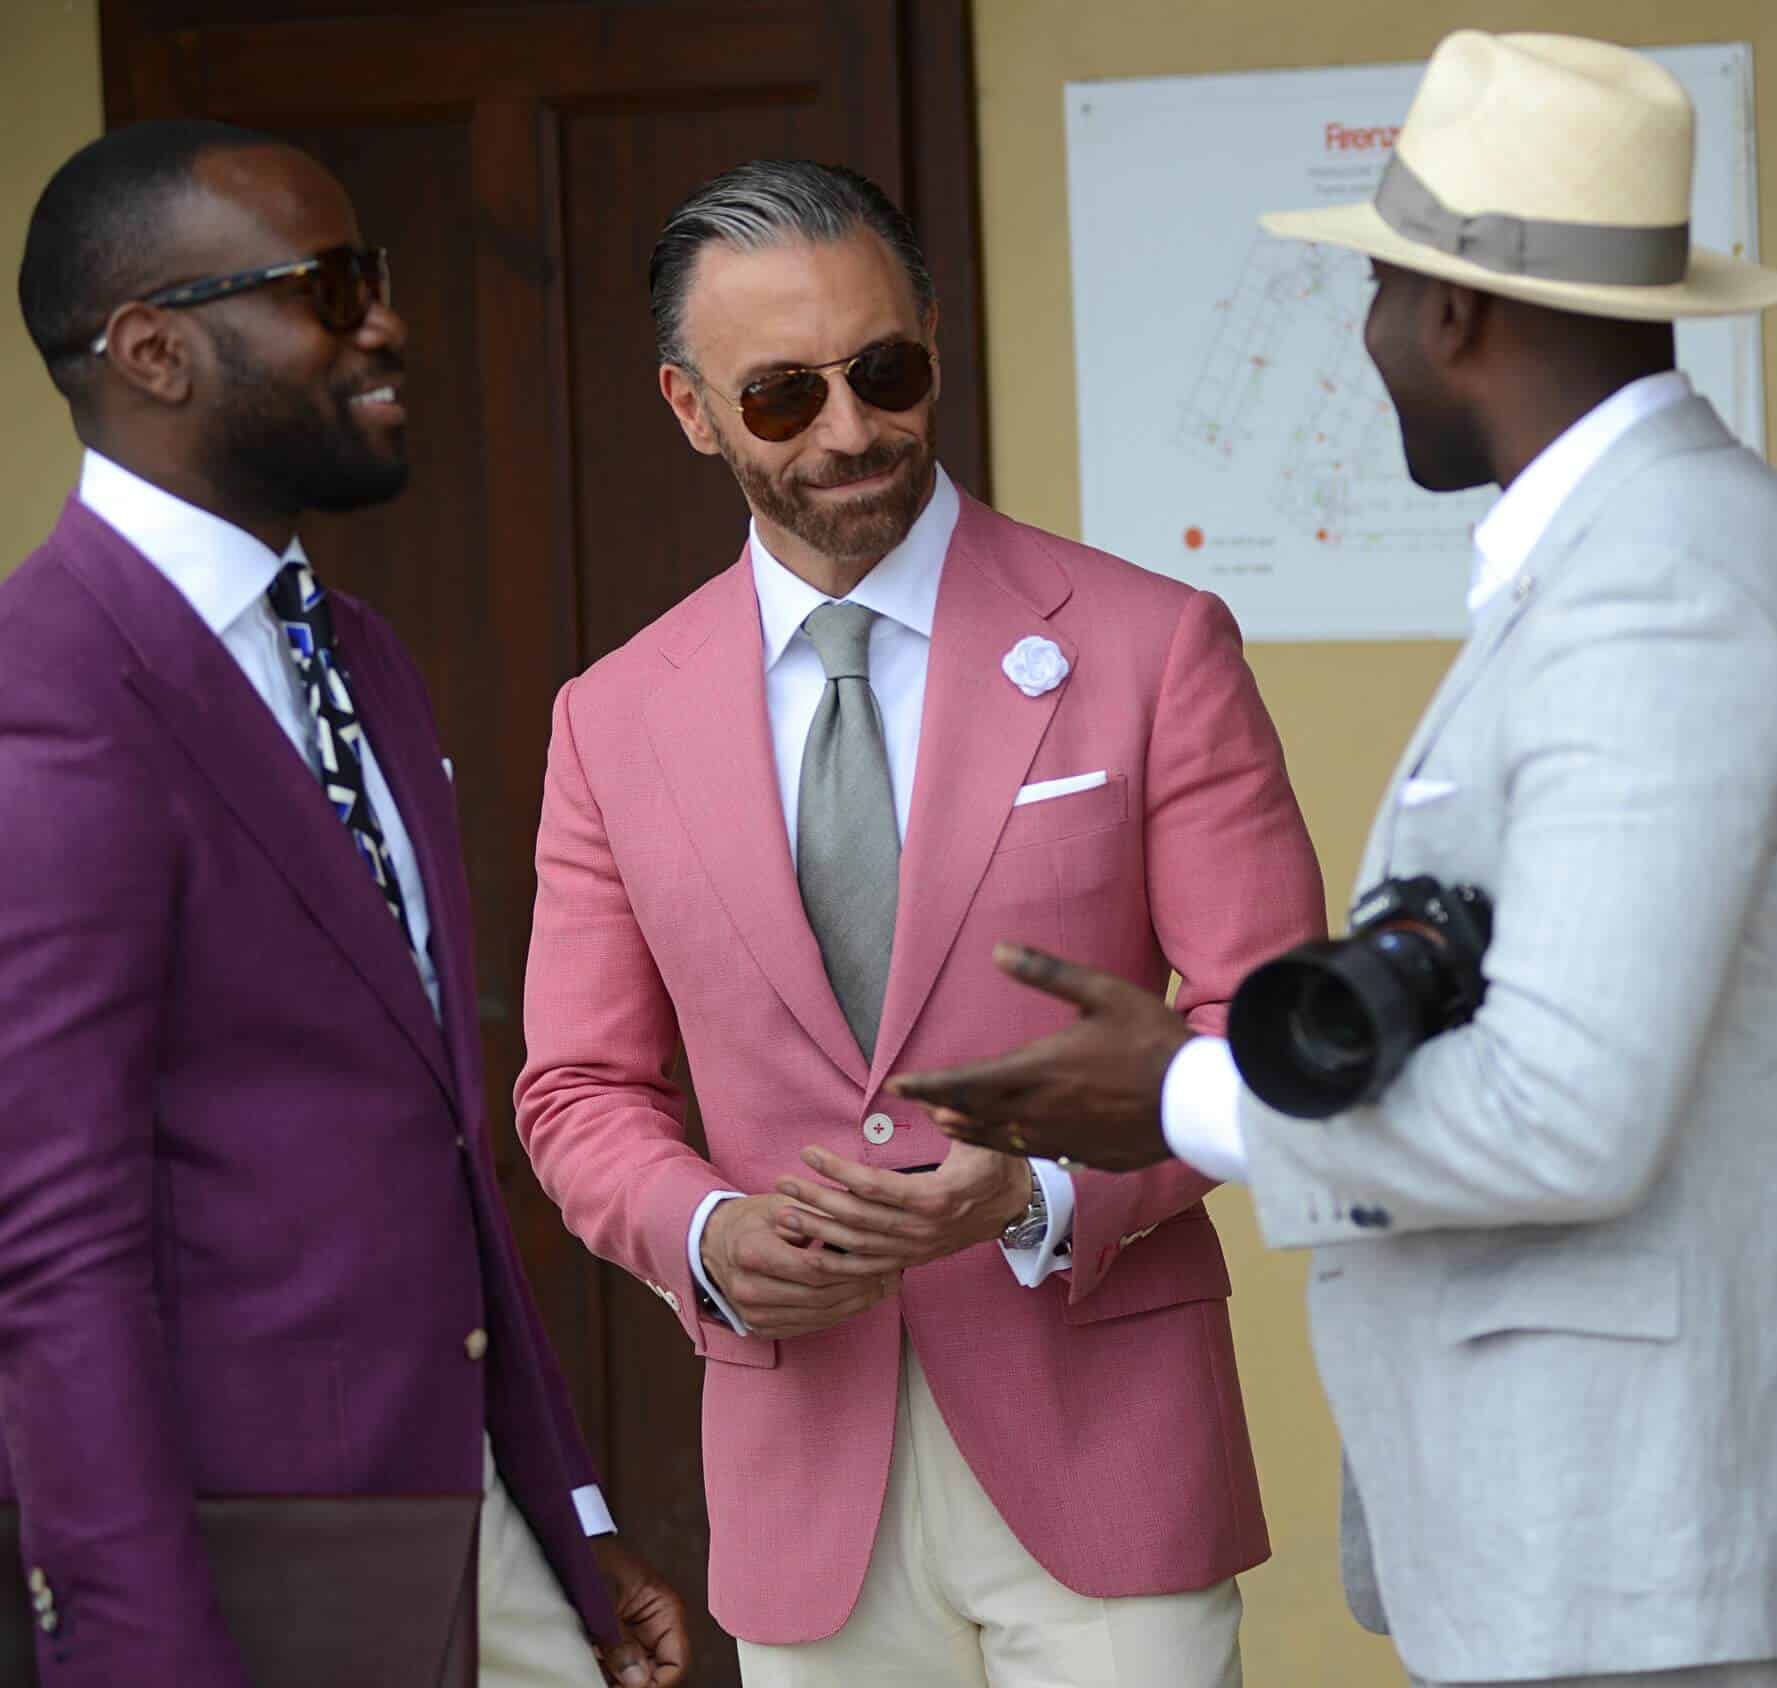 Is Pink In Fashion  Men